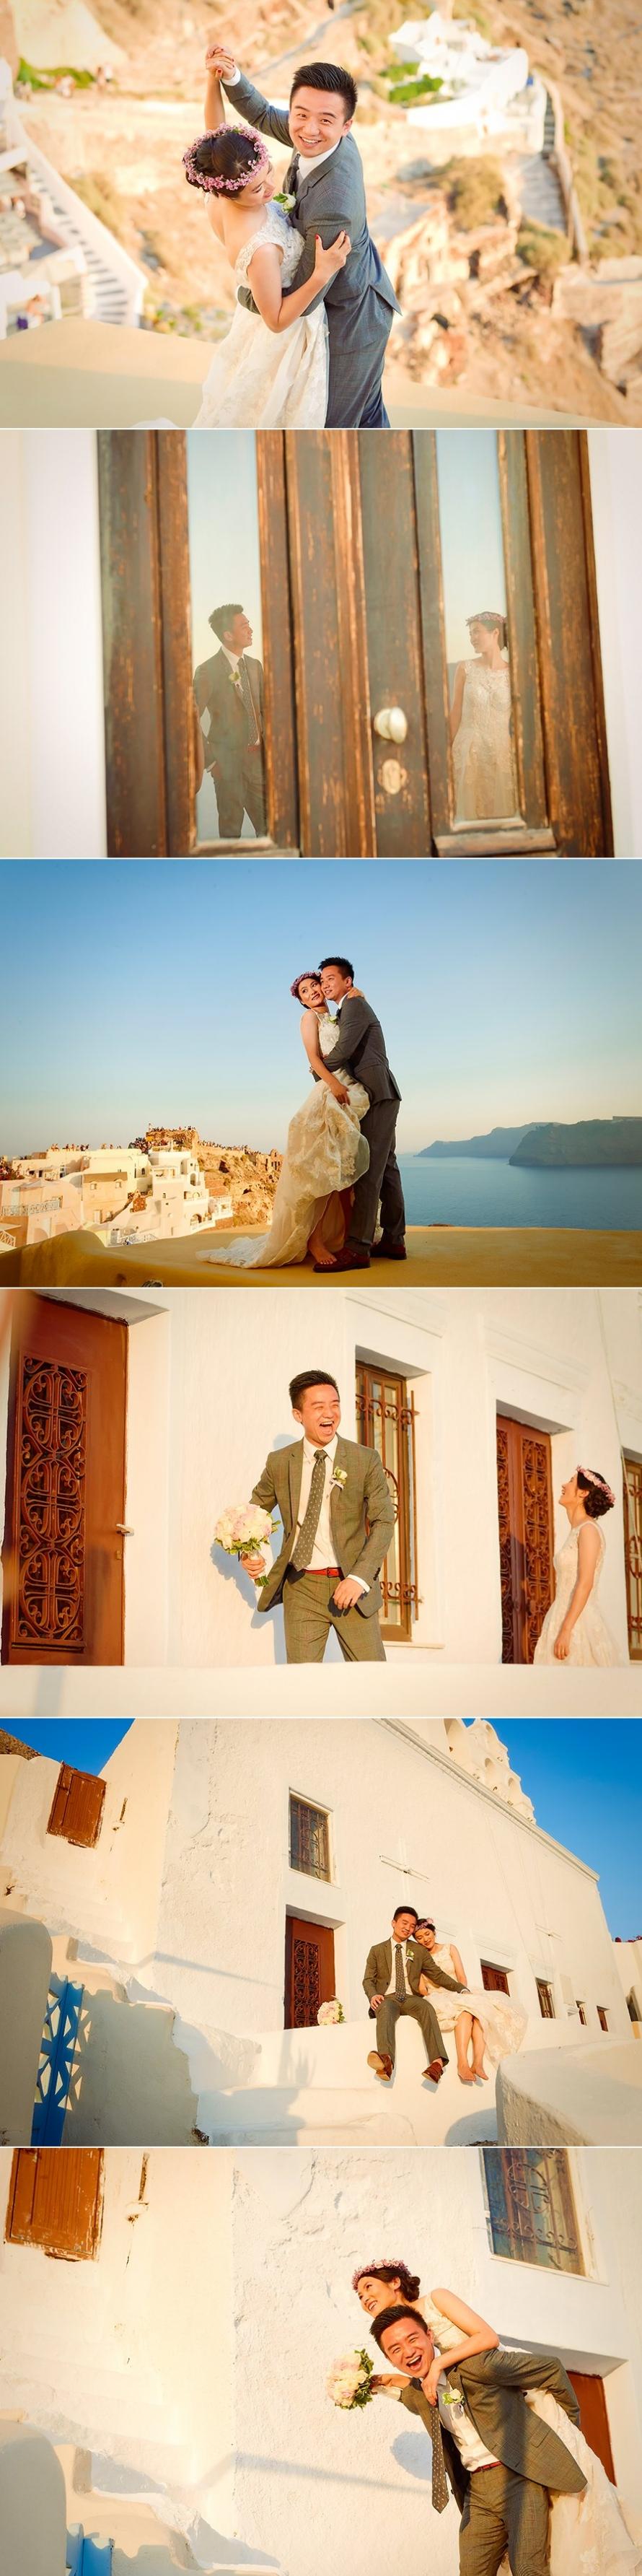 Omi Lili wedding photo06